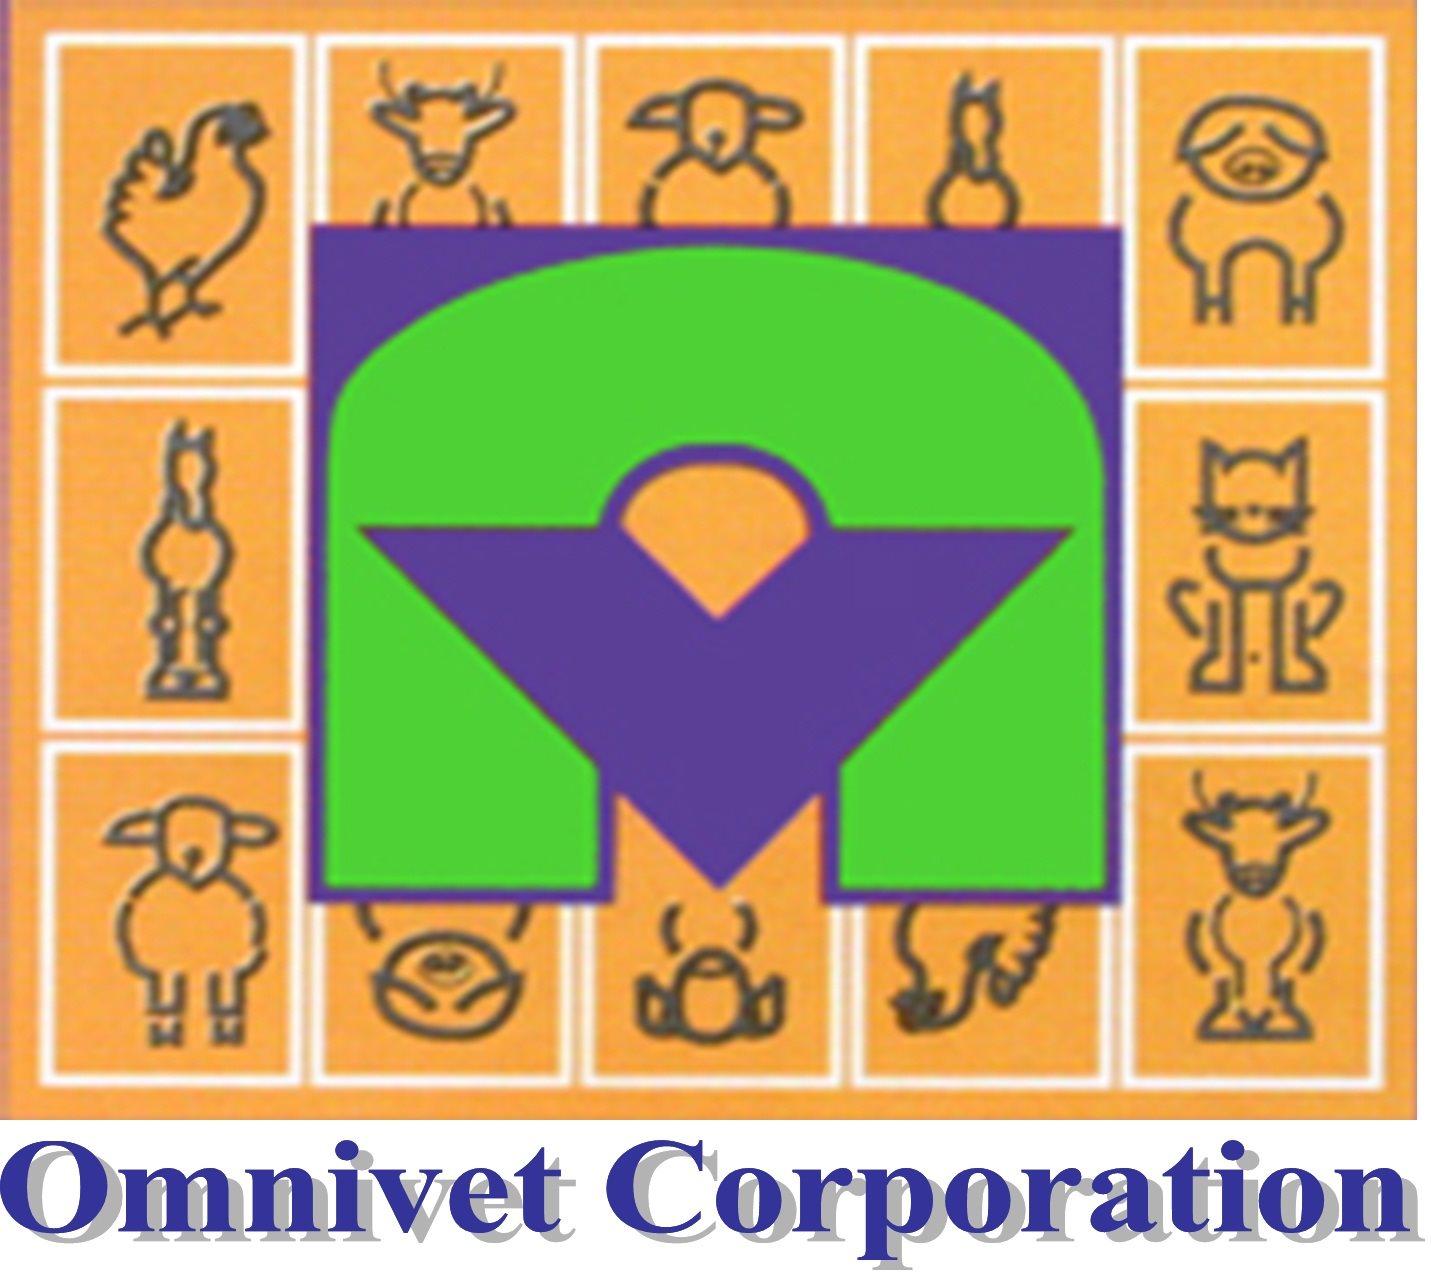 OmniVet Corporation